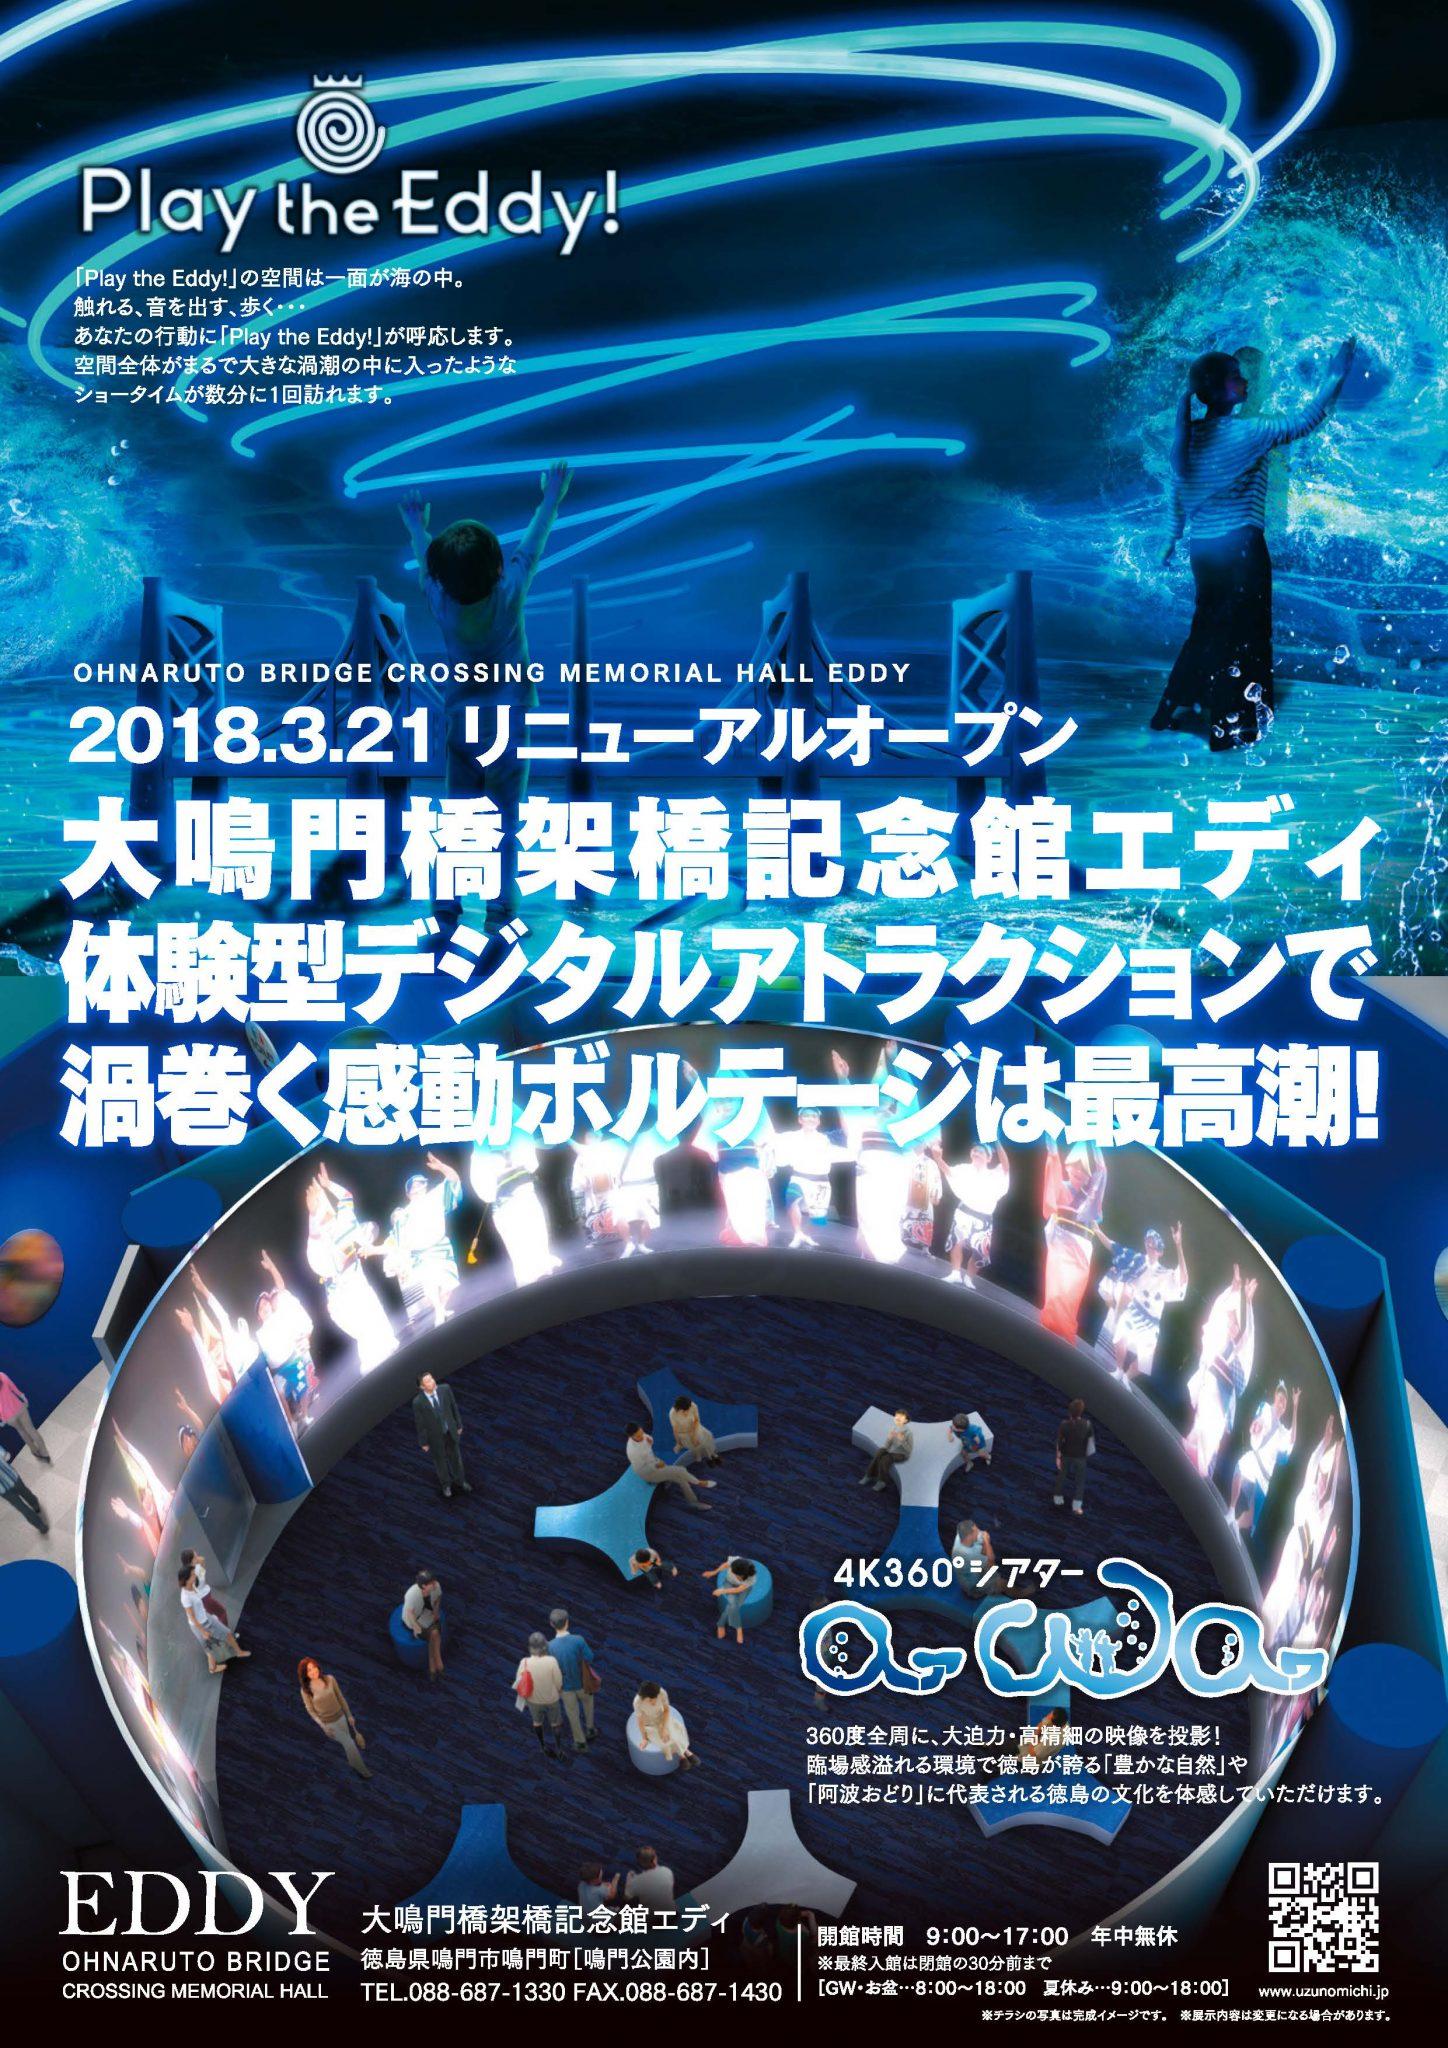 https://www.oboke-iya.jp/kawaraban/5763e11abbc01d0e776c84a65917d91a.jpg